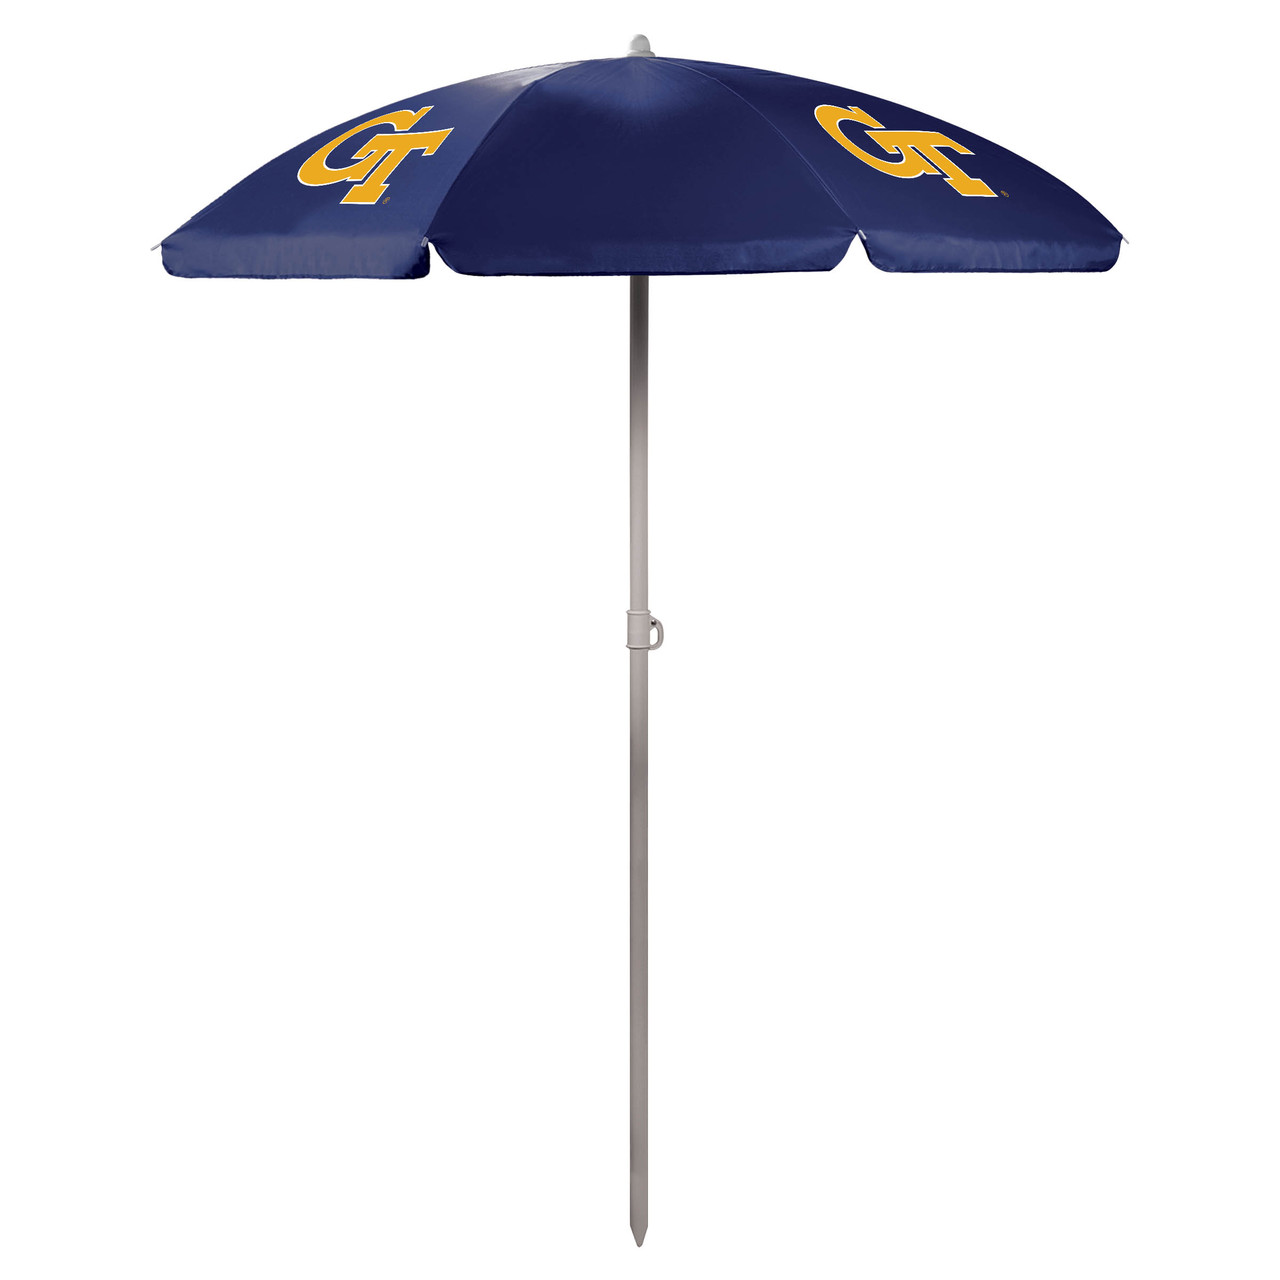 Umbrella - Georgia Tech